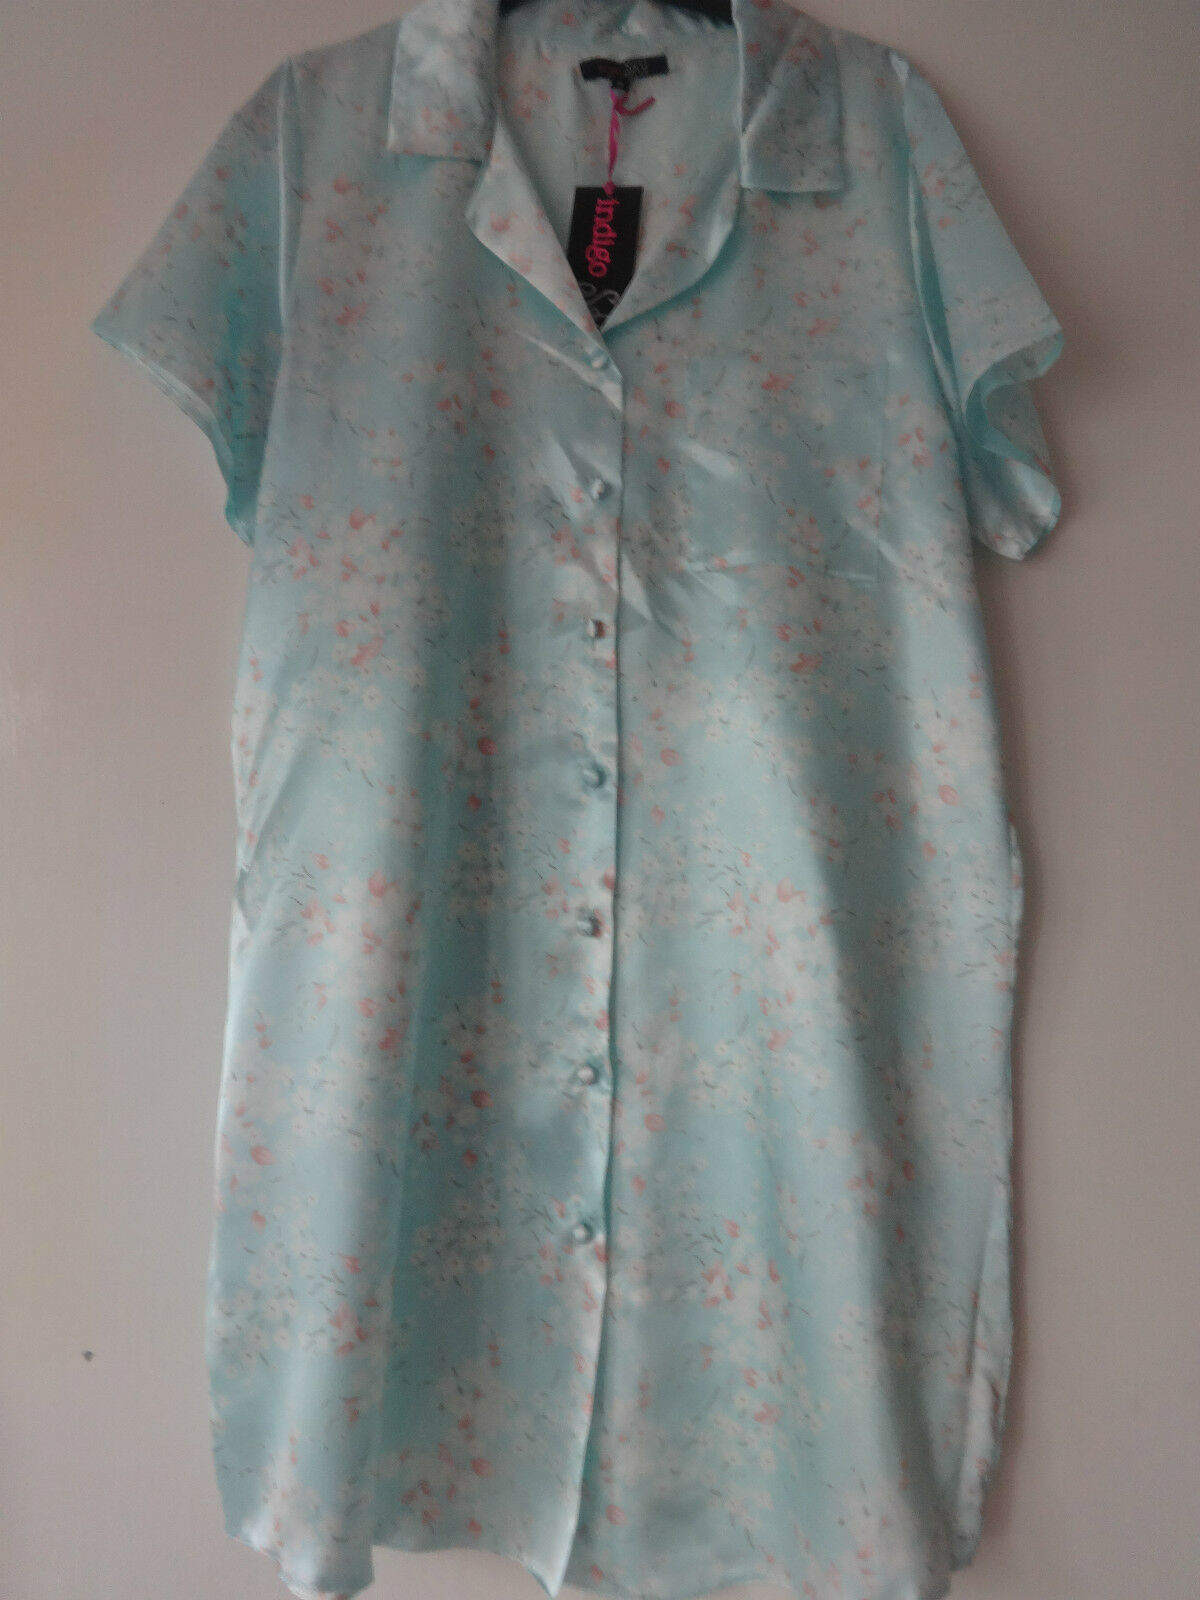 Ladies Short Sleeve Satin Nightshirt//Nightdress Mint Green sizes 10 /&12 only